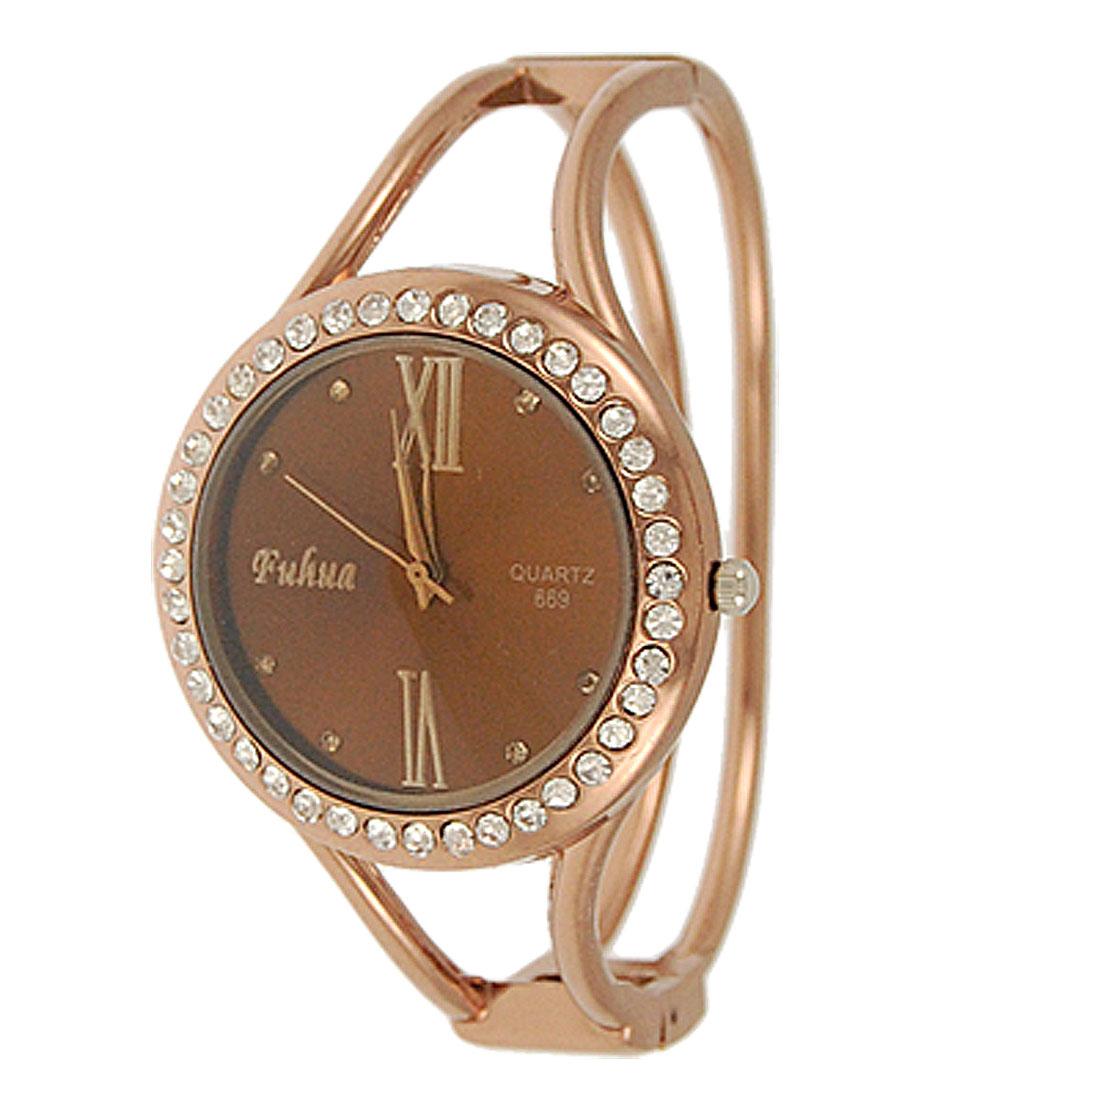 Woman Rhinestone Decor Spring Loaded Alloy Bracelet Watch Copper Tone